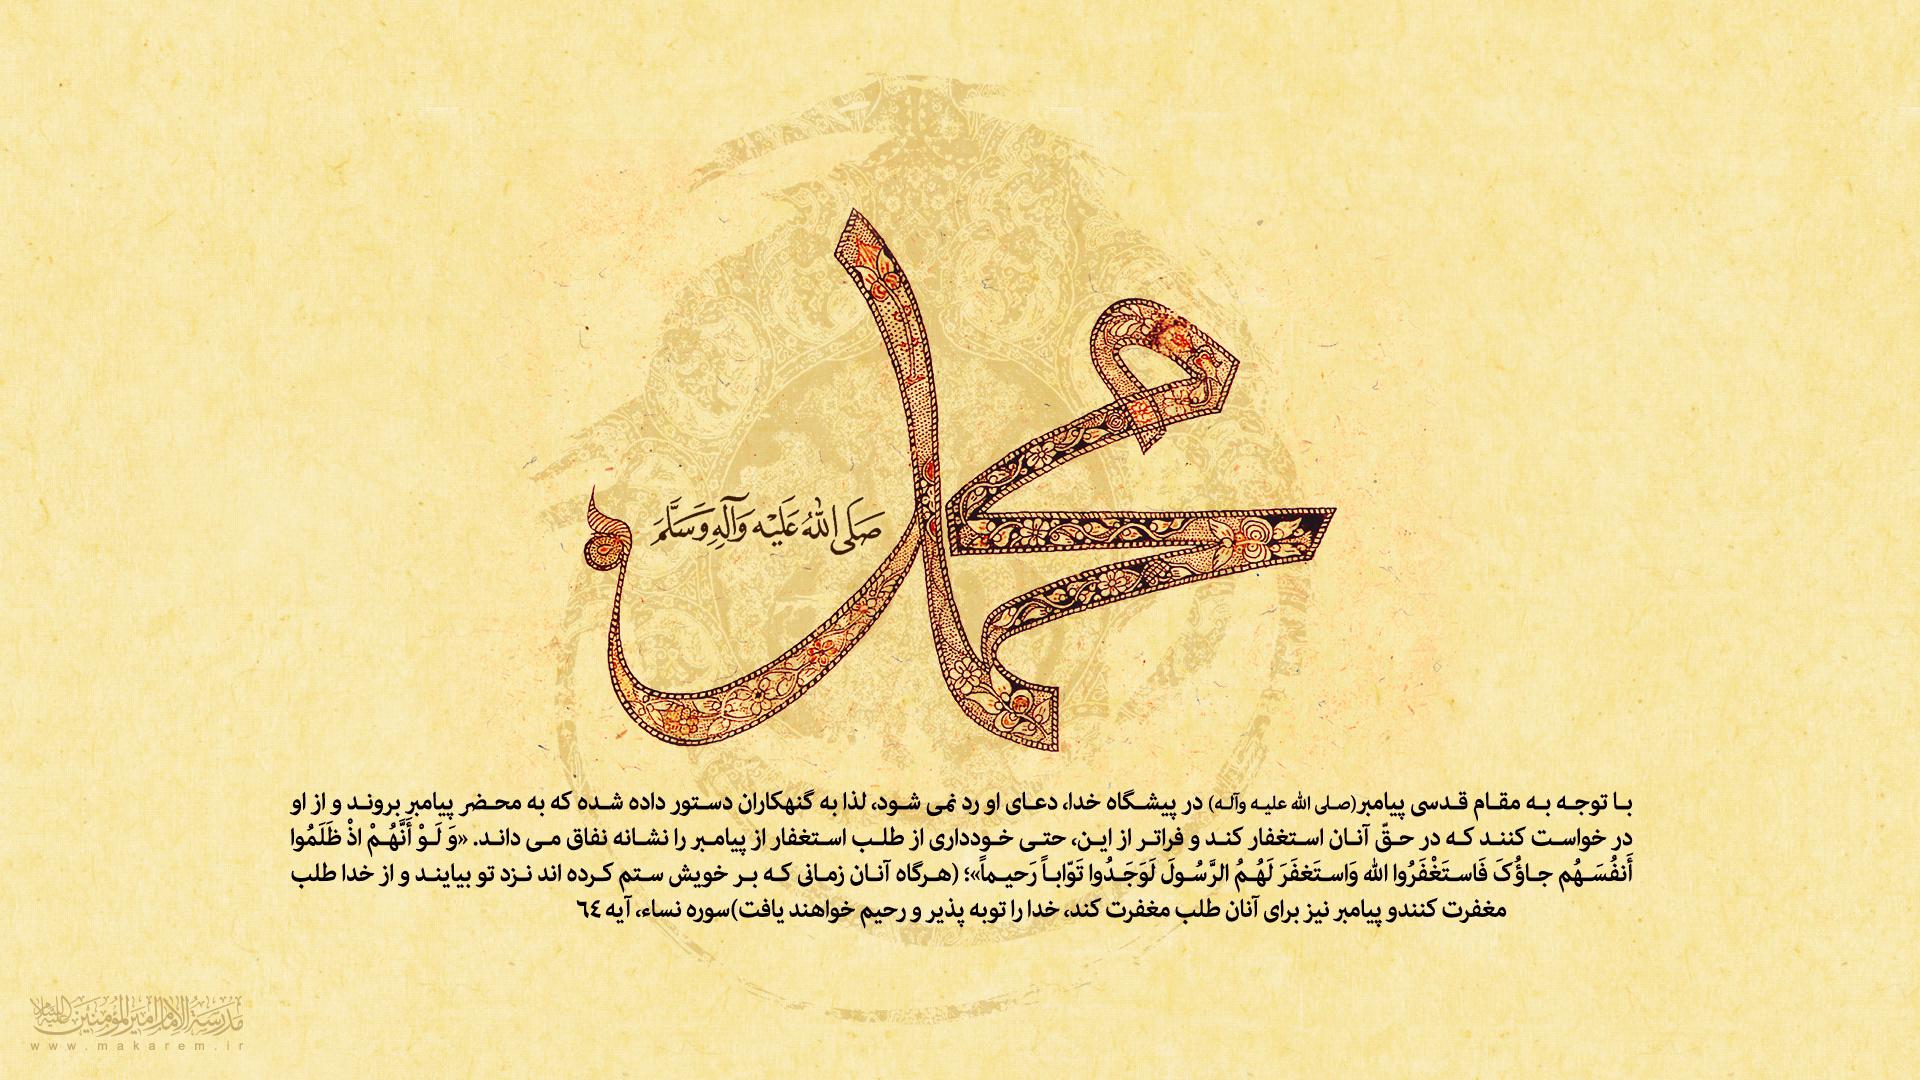 ولادت پیامبر 03-مدرسه الامام امیر المومنین (ع)